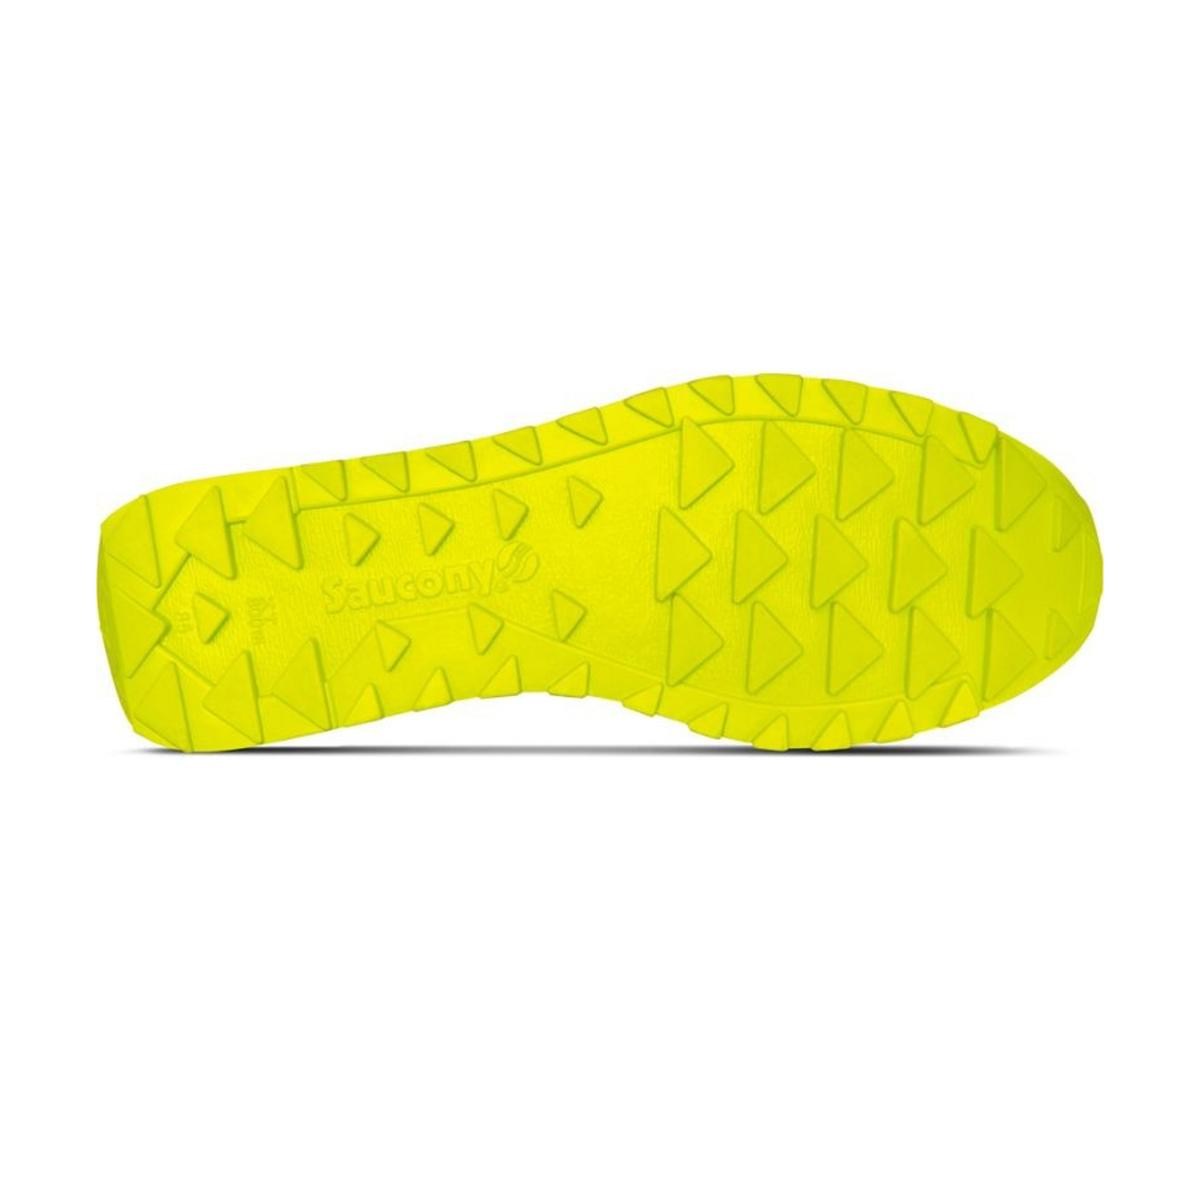 Scarpe Sneakers Saucony Jazz Original camouflage da uomo rif. S2044-537